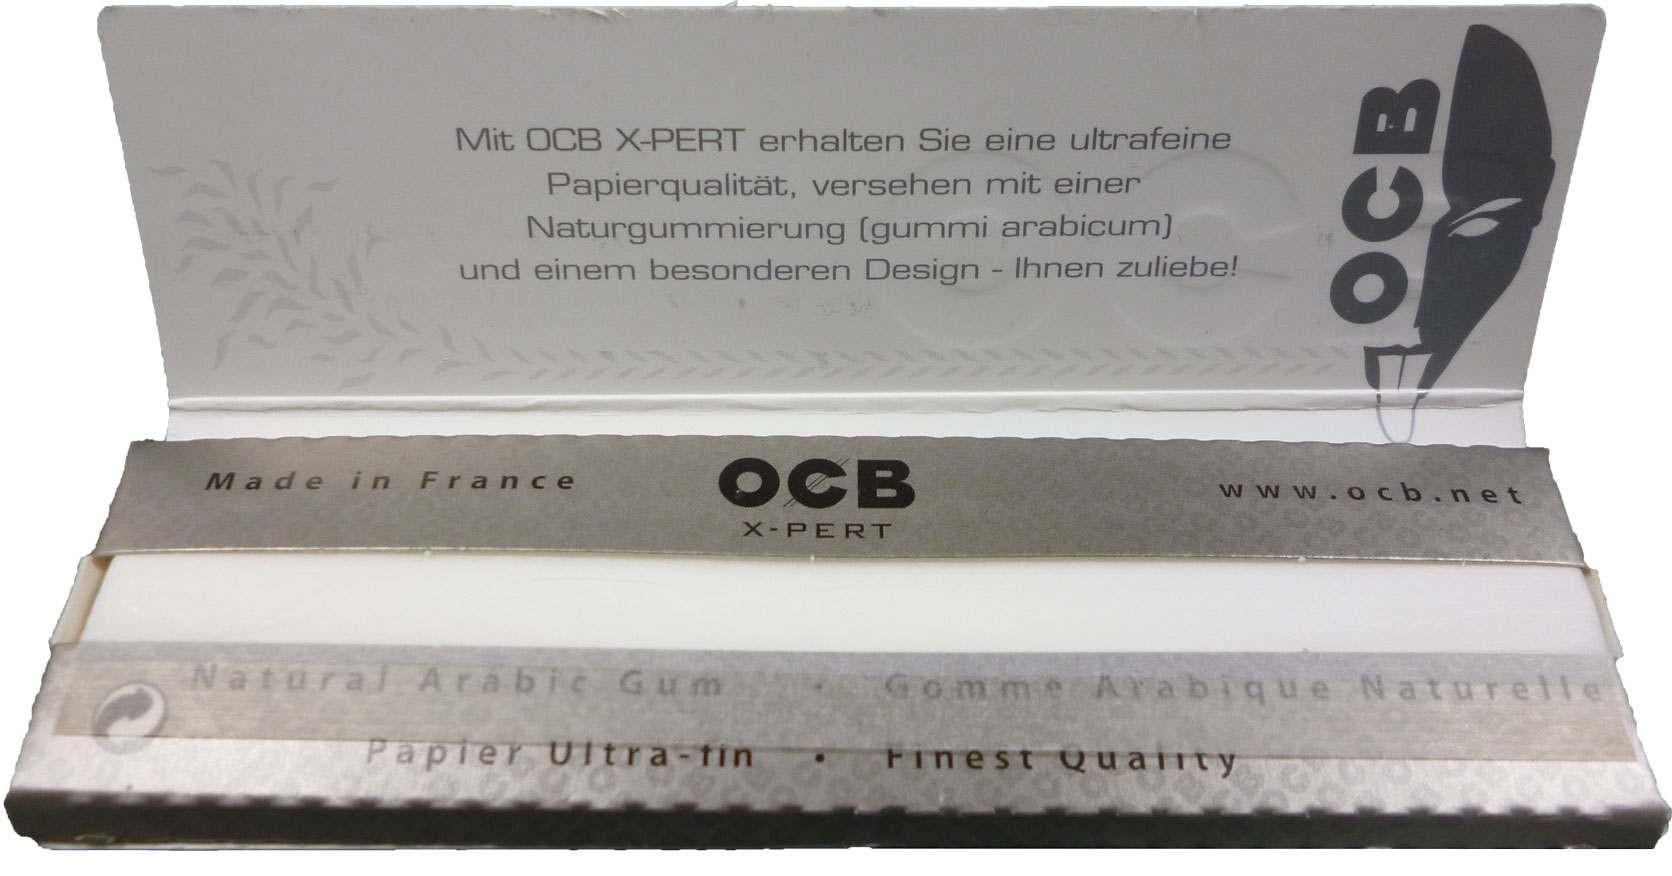 OCB X-Pert geöffnete Packung